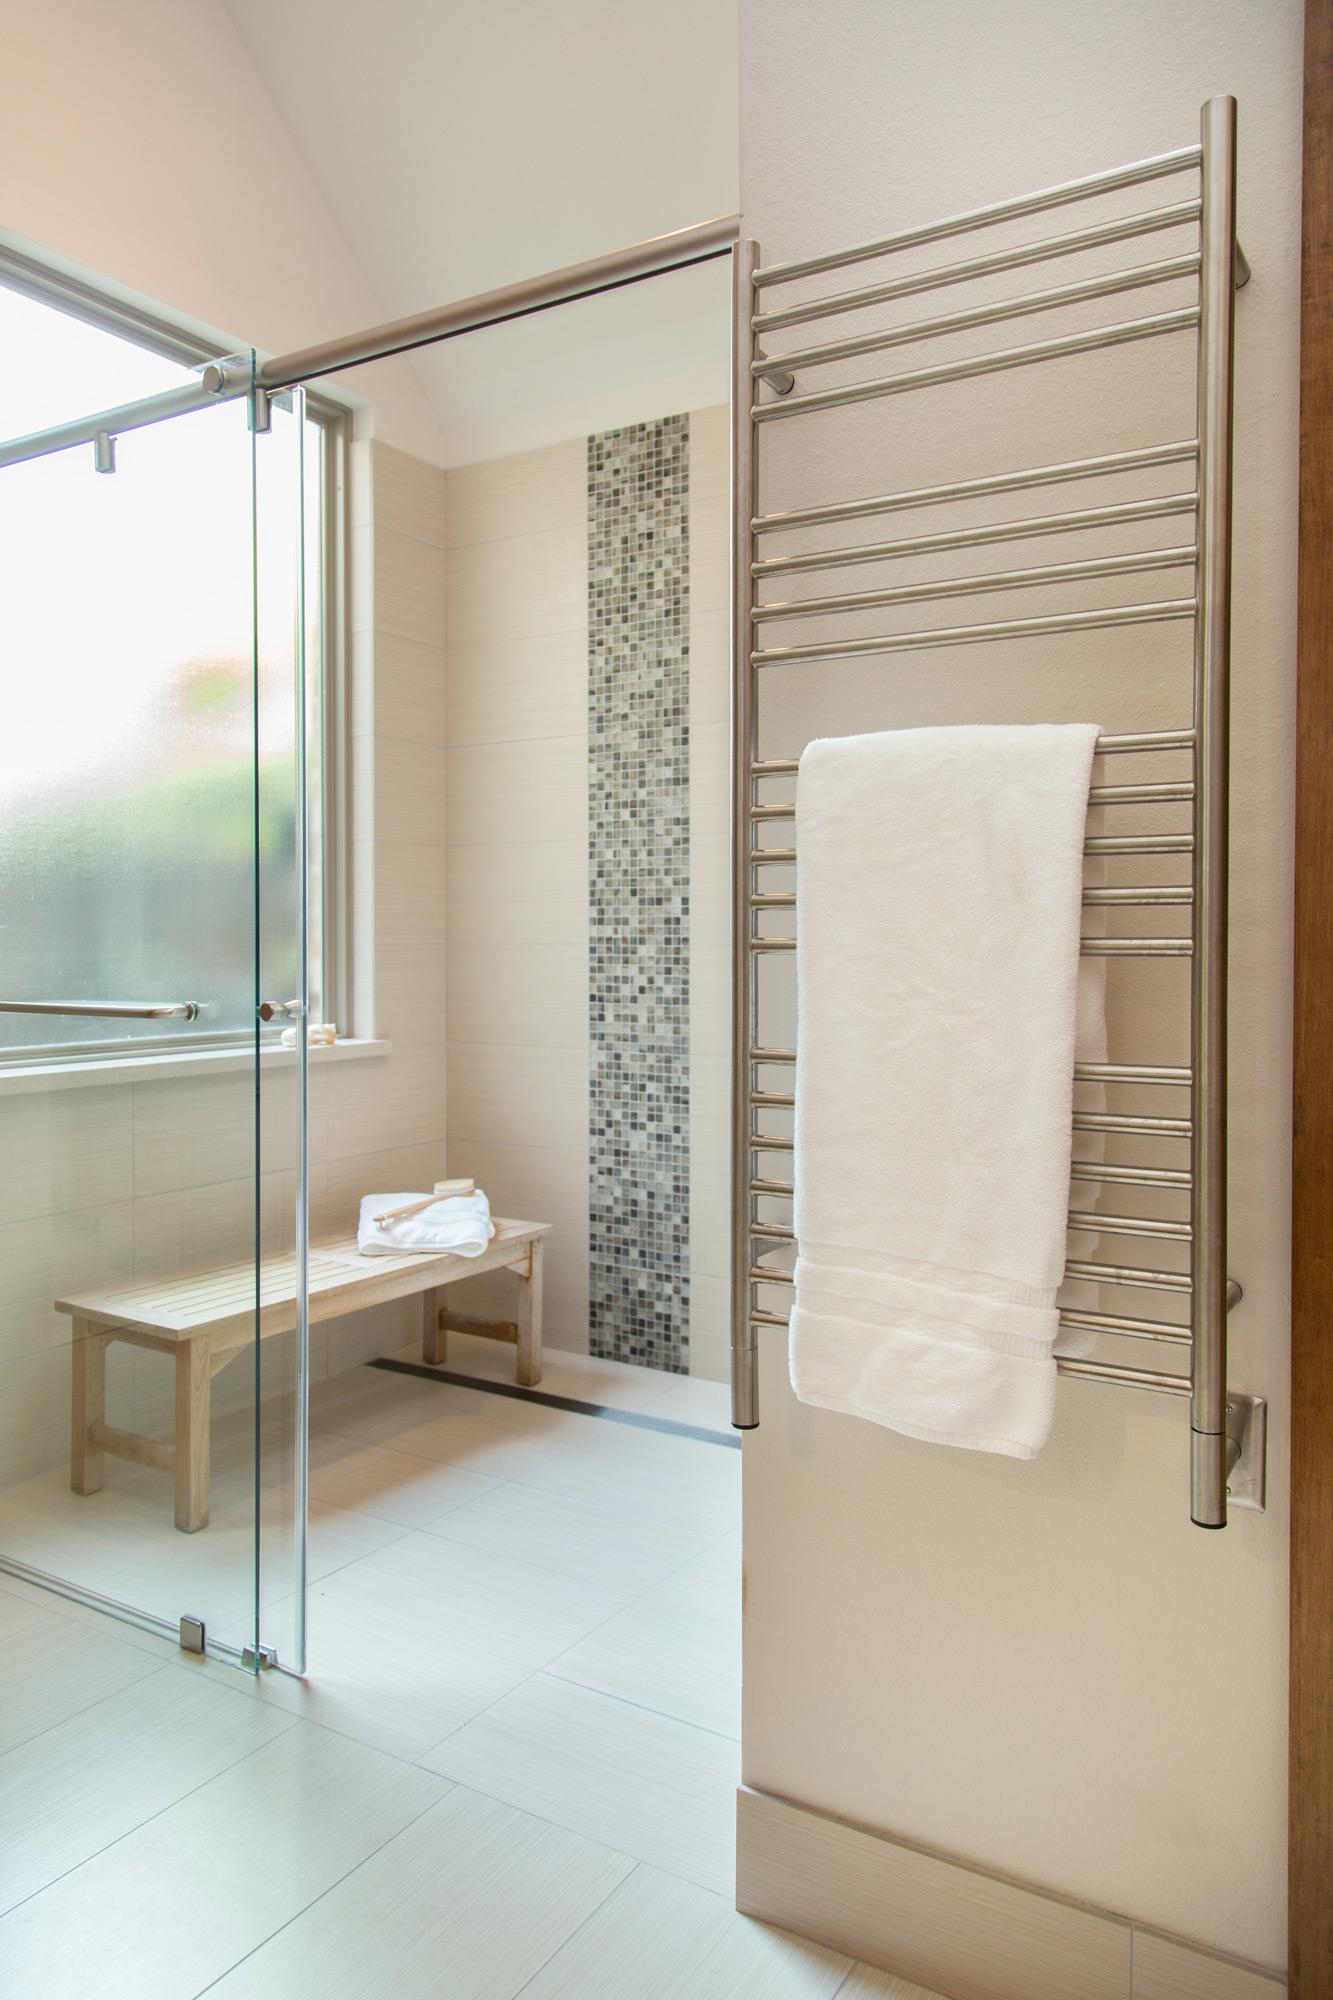 Curbless or zero entry shower in master bathroom | Carla Aston, Designer | Tori Aston, Photographer | #showertile #bathroomdesign #shower